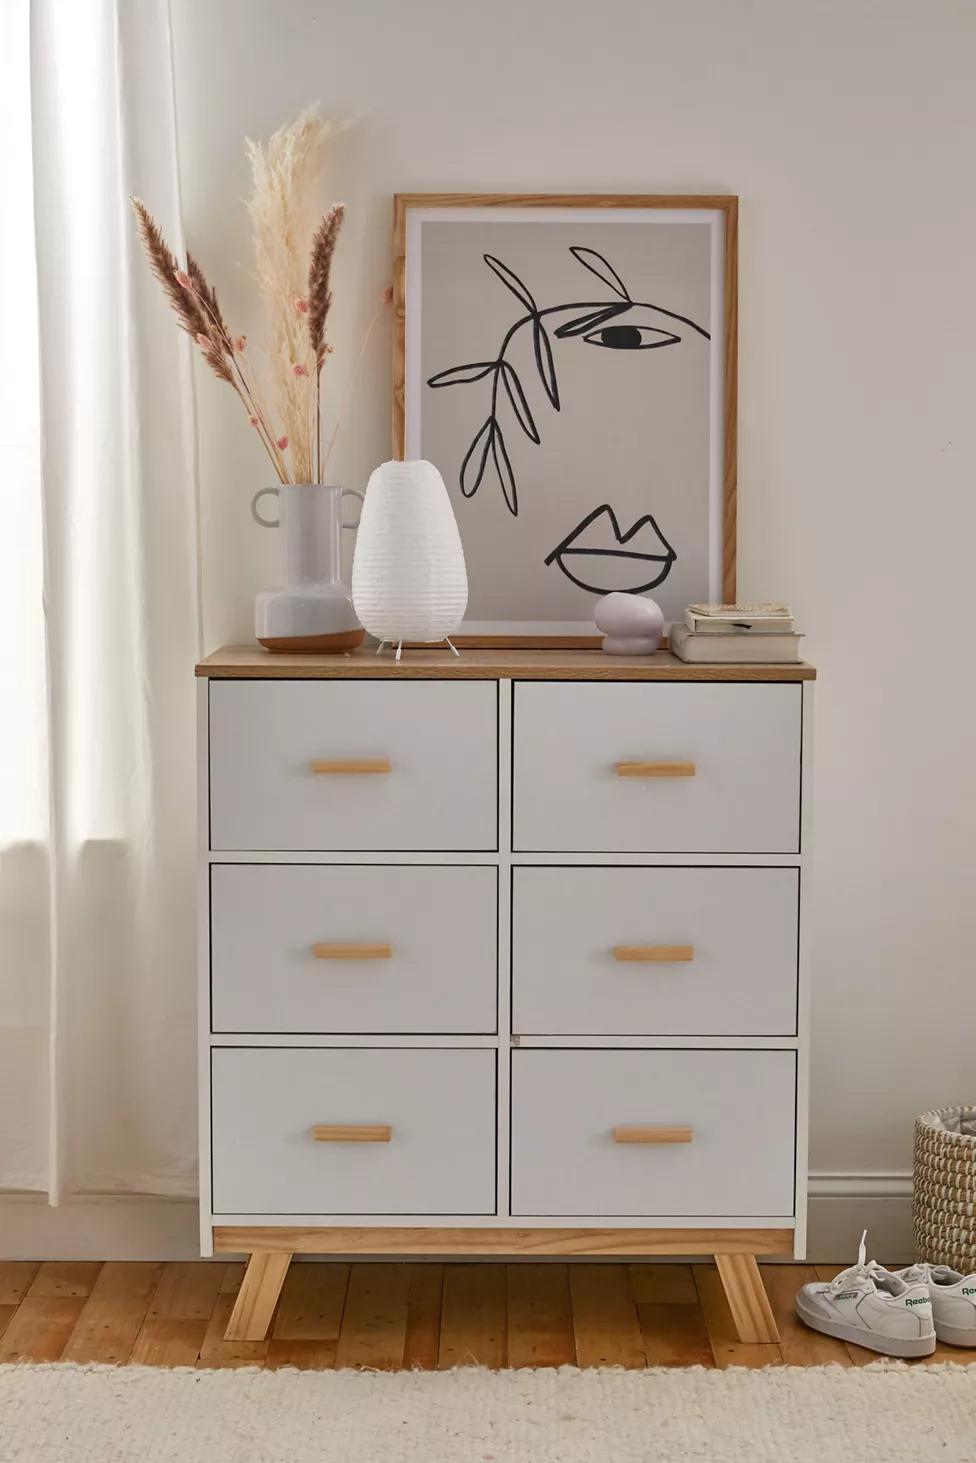 Piper 6 Drawer Dresser 6 Drawer Dresser Dresser Drawers Furniture [ 1463 x 976 Pixel ]